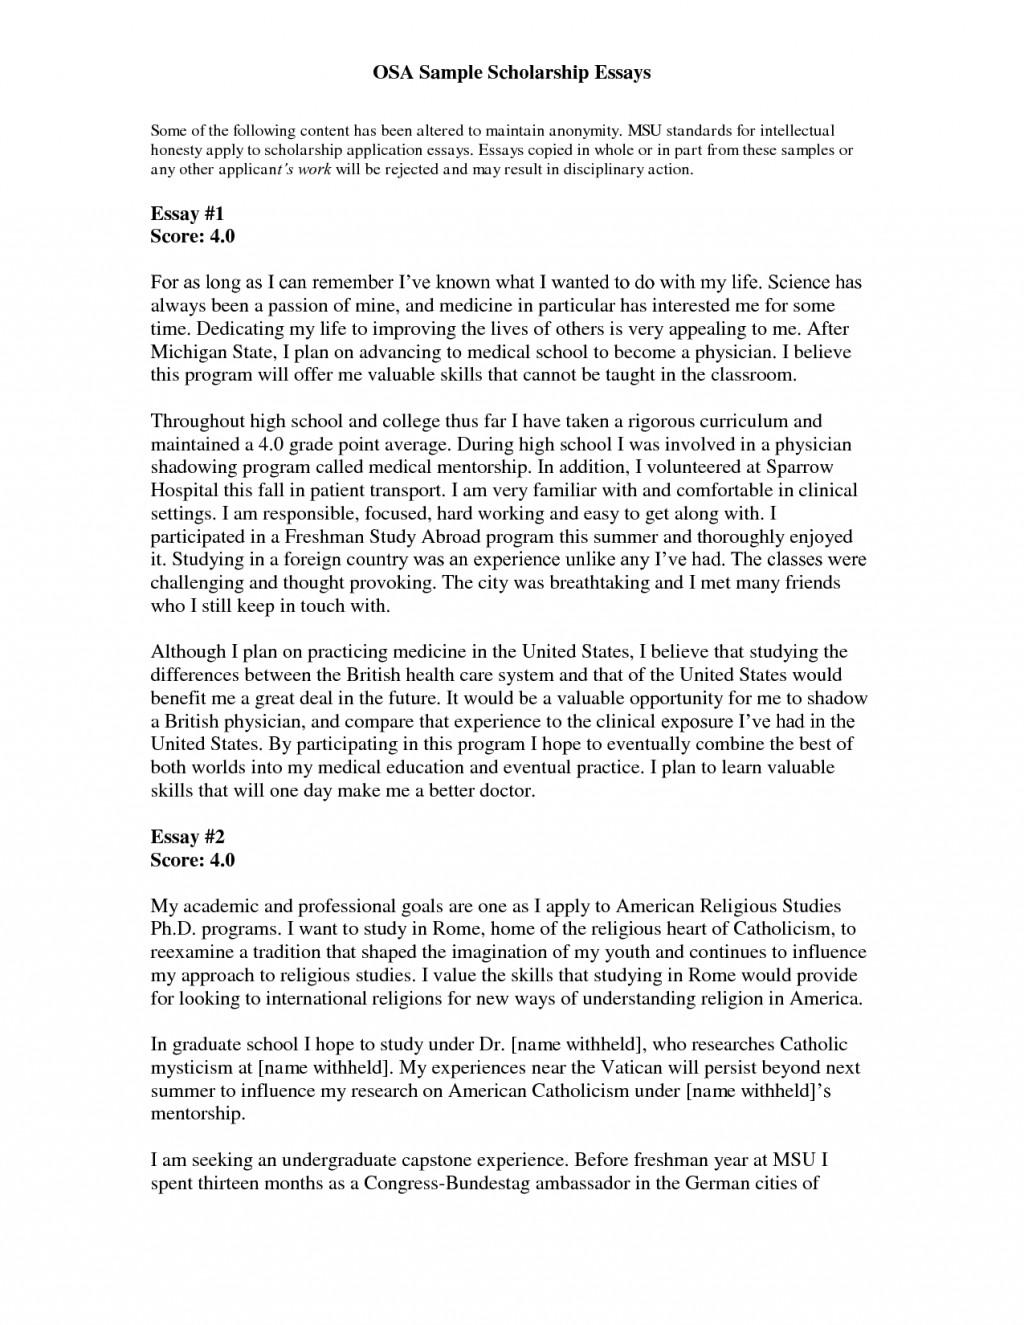 018 Write My Essay For Free Shocking Me Uk Online Large